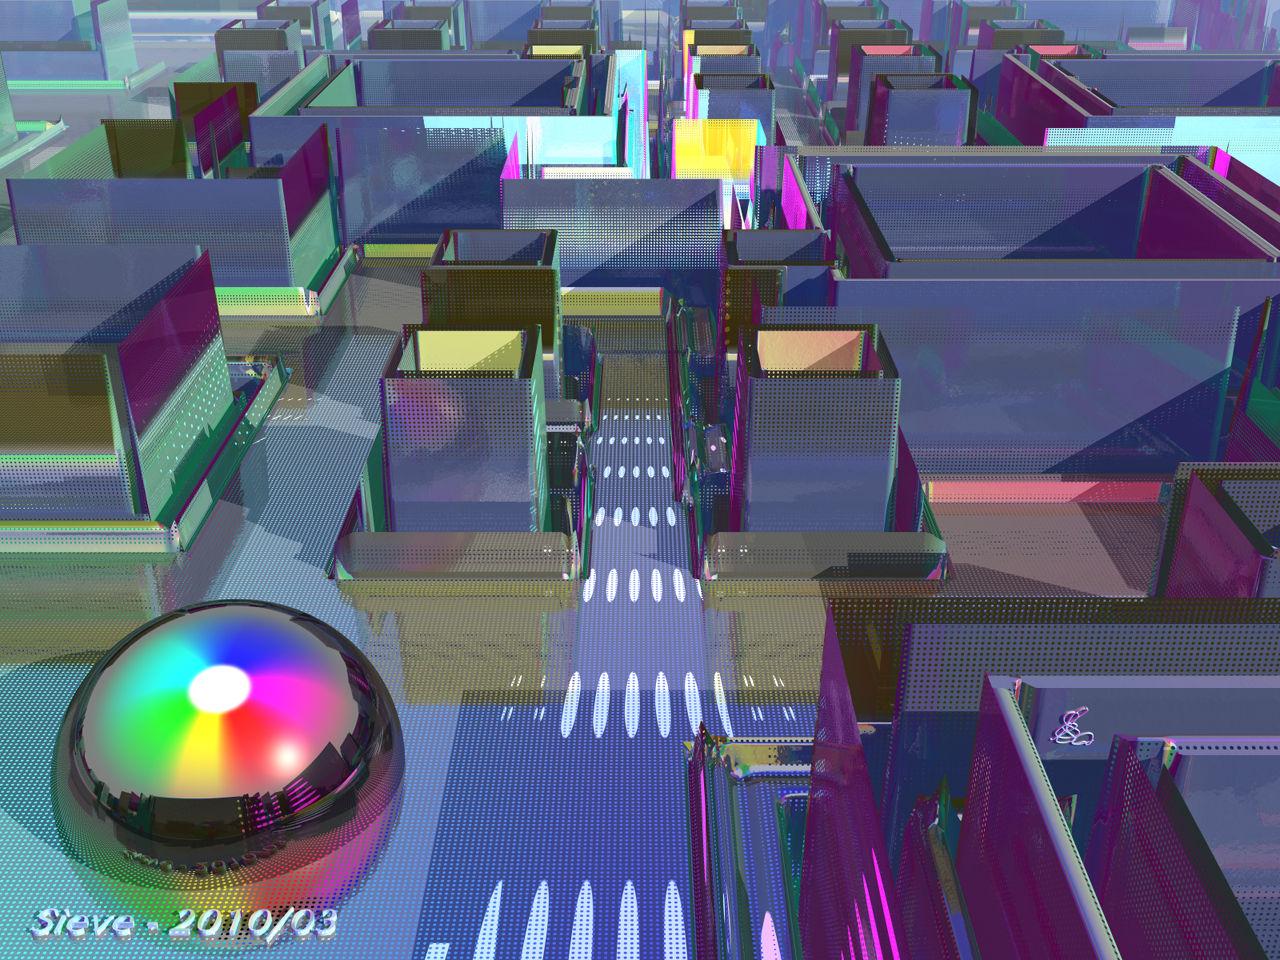 Sieve - Bryce 3D render by Horo